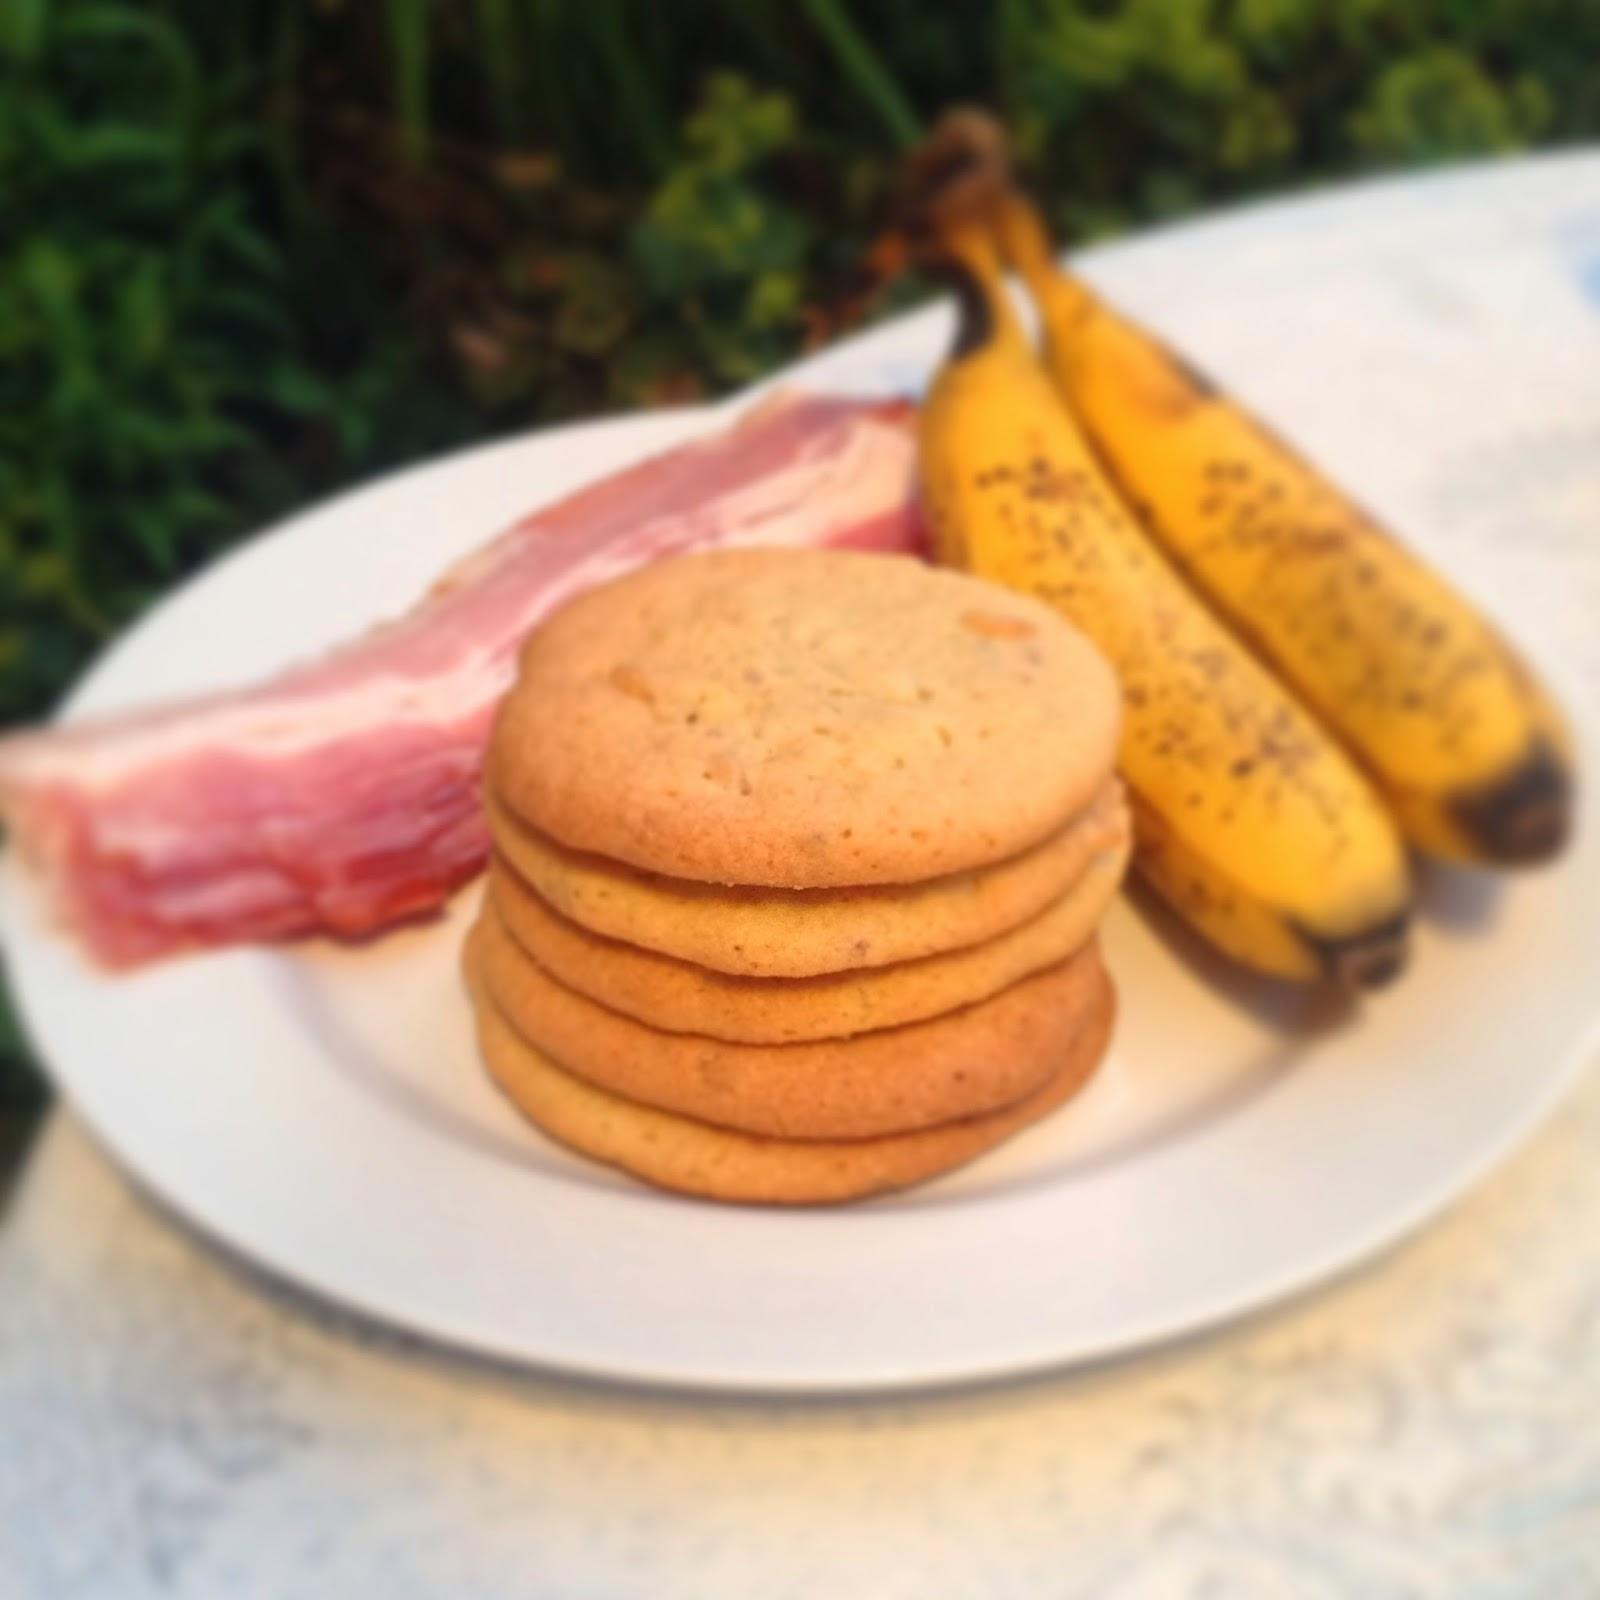 Bacon and Banana Cookies